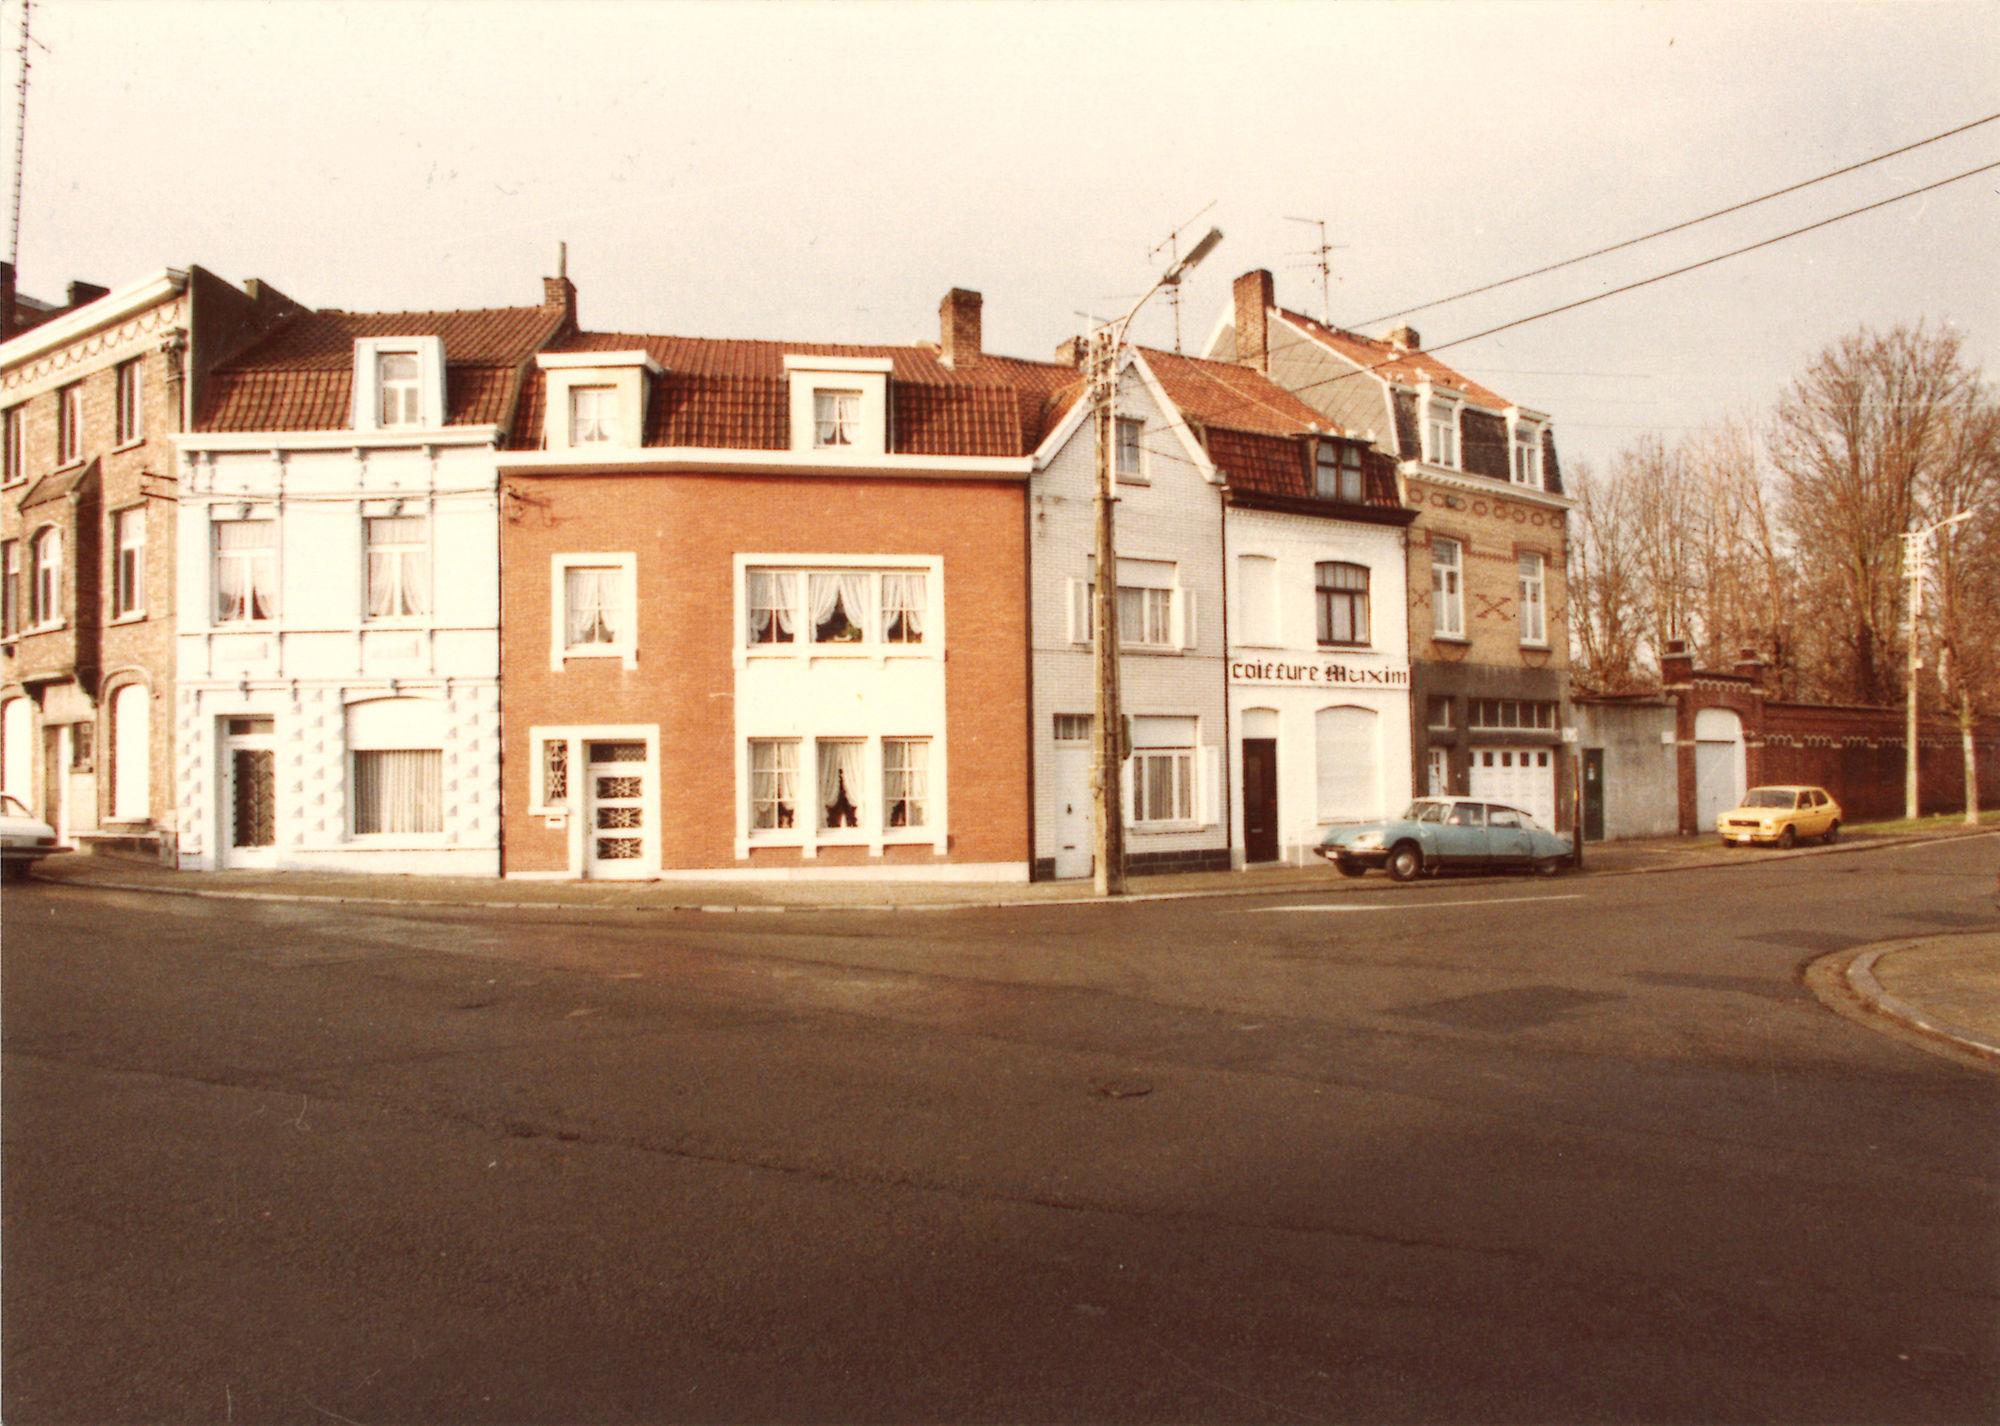 Nijverheidskaai-Burgemeester Schinkelstraat 1984